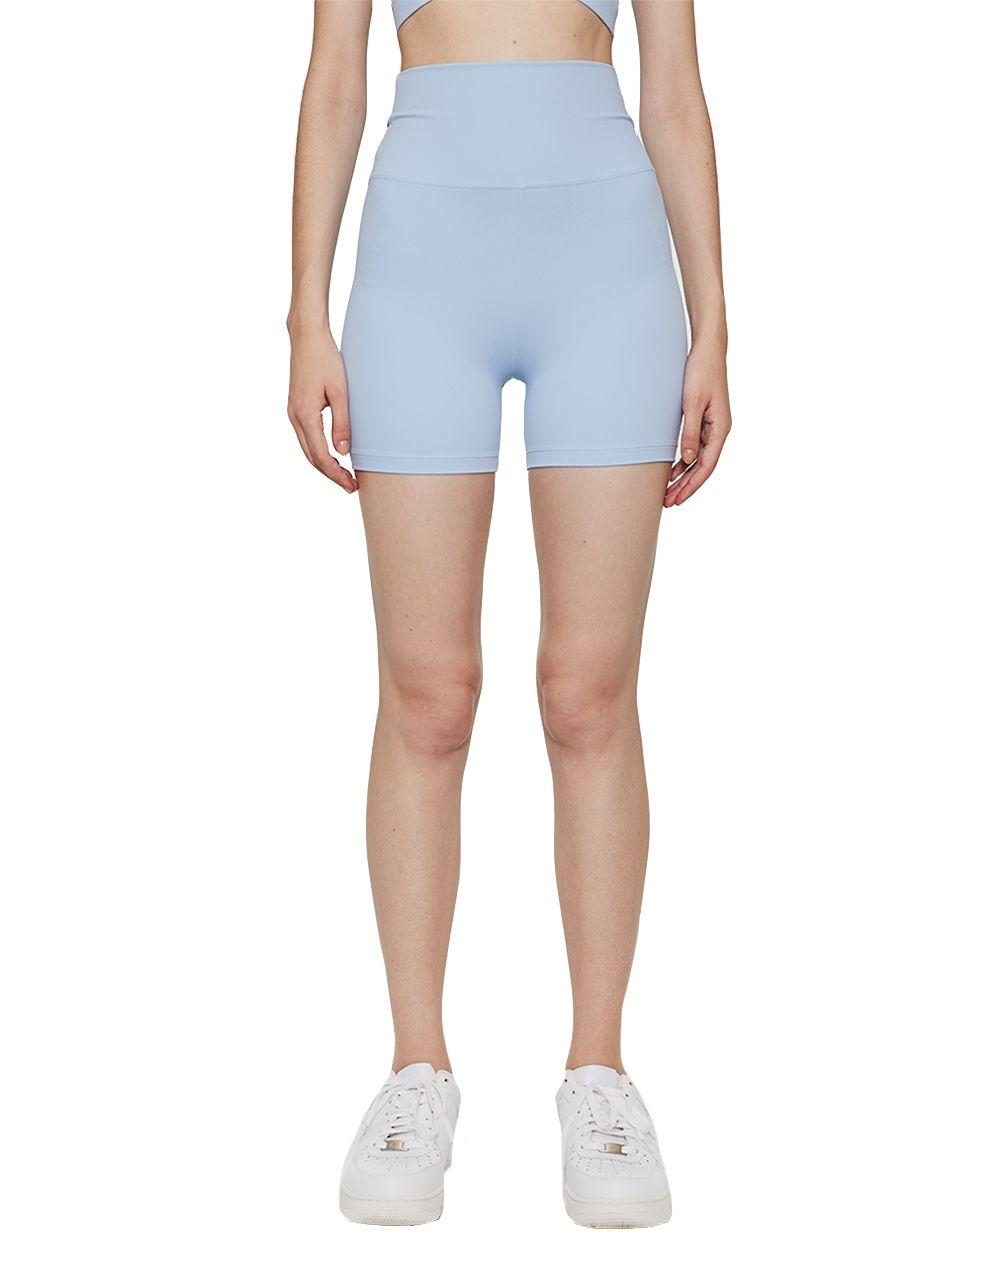 YUYU+Essential Biker Shorts